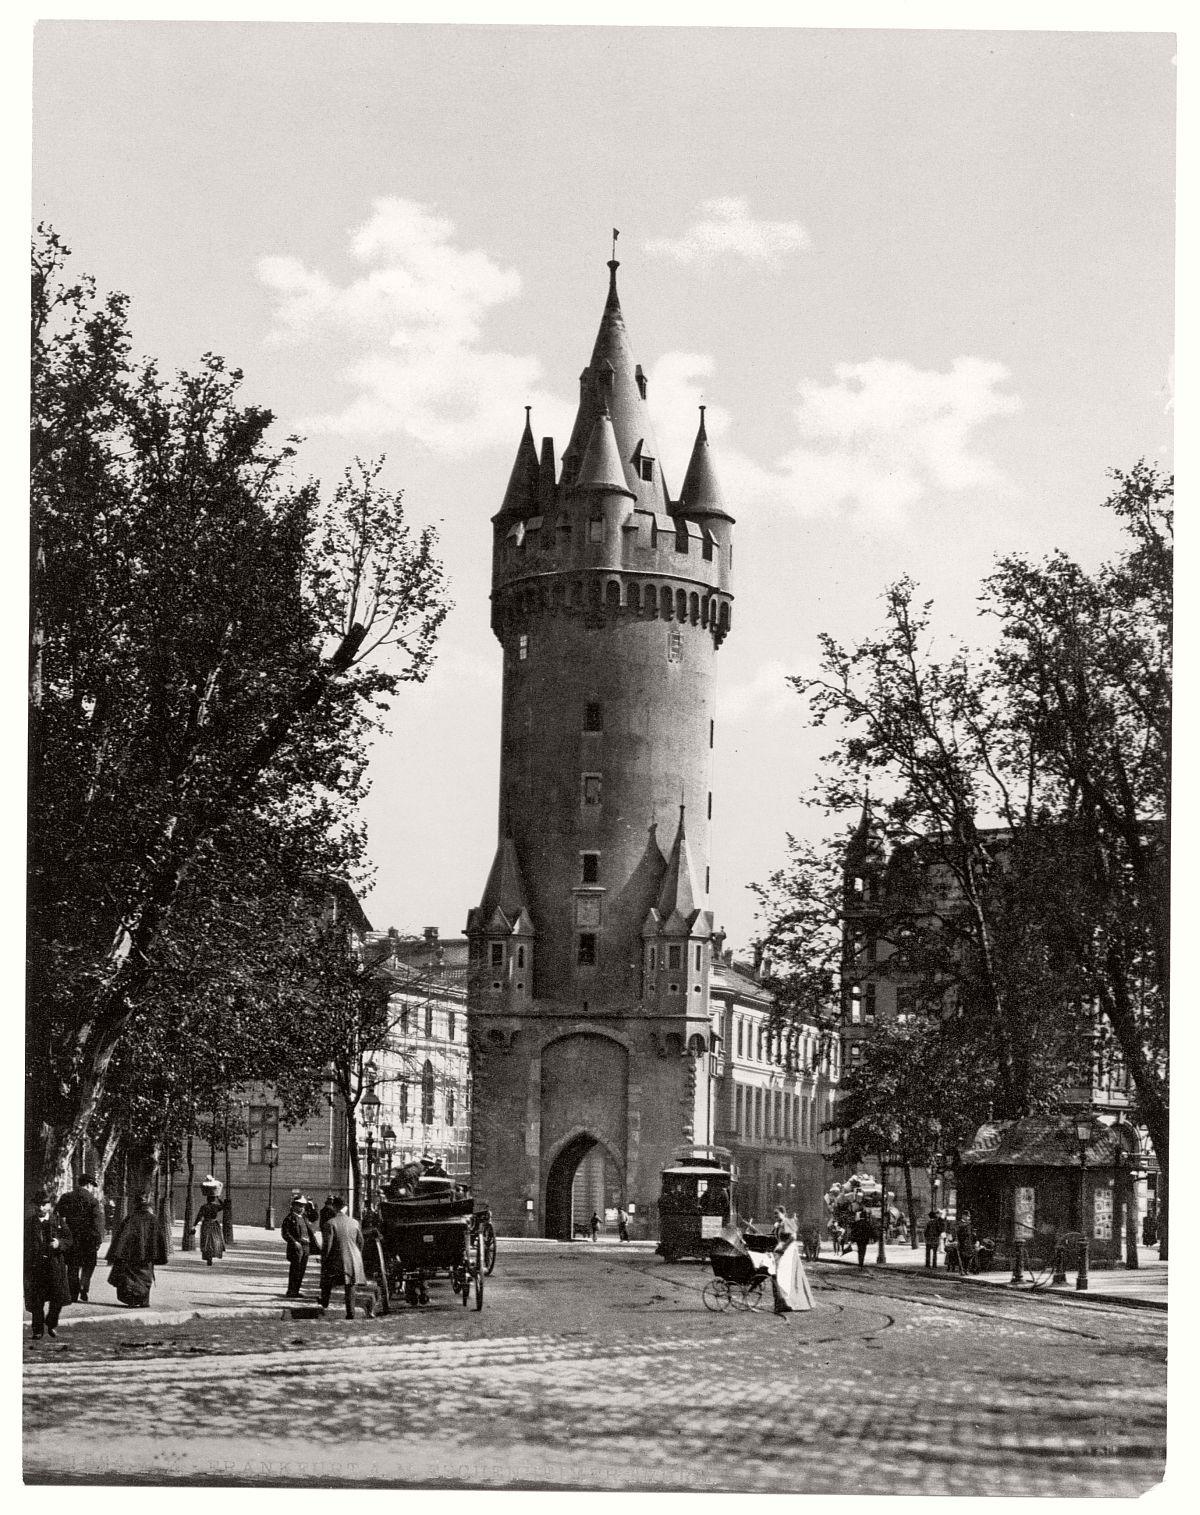 vintage-historic-photos-of-frankfurt-am-main-germany-circa-1890s-19th-century-06